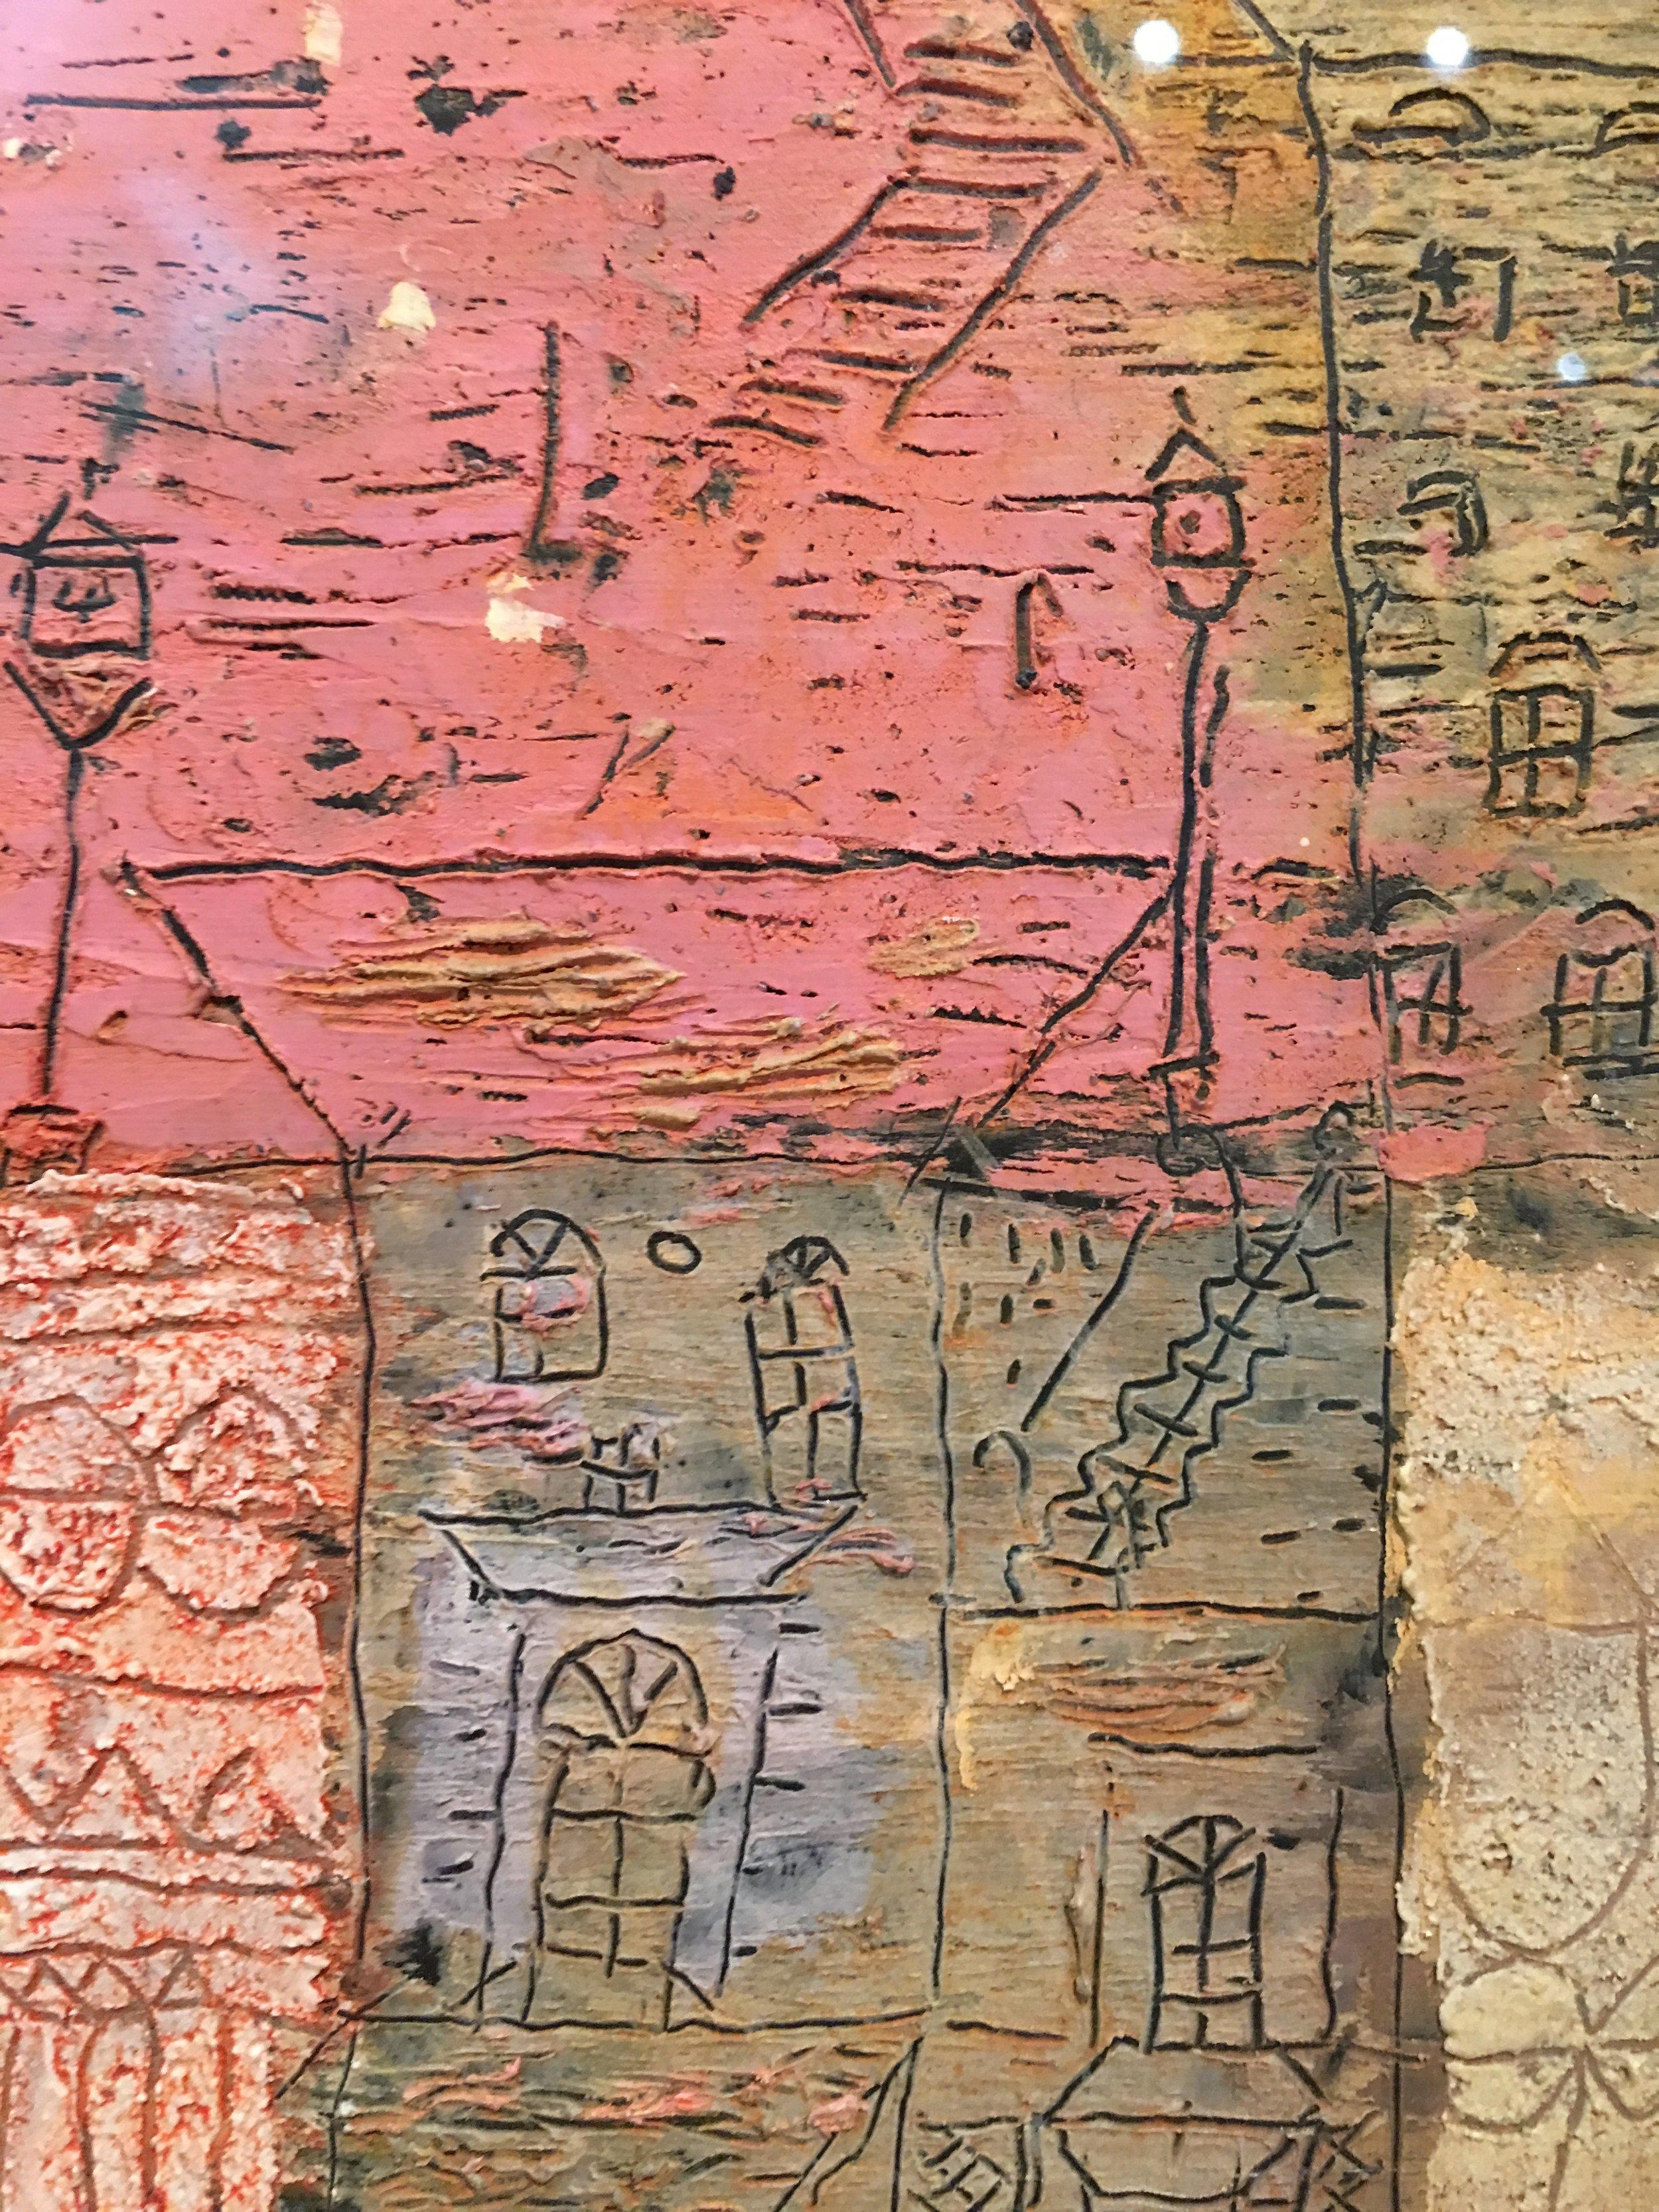 Detail from 'The villas of Florence' Paul Klee-1926 (Pompidou Centre-Paris, France)